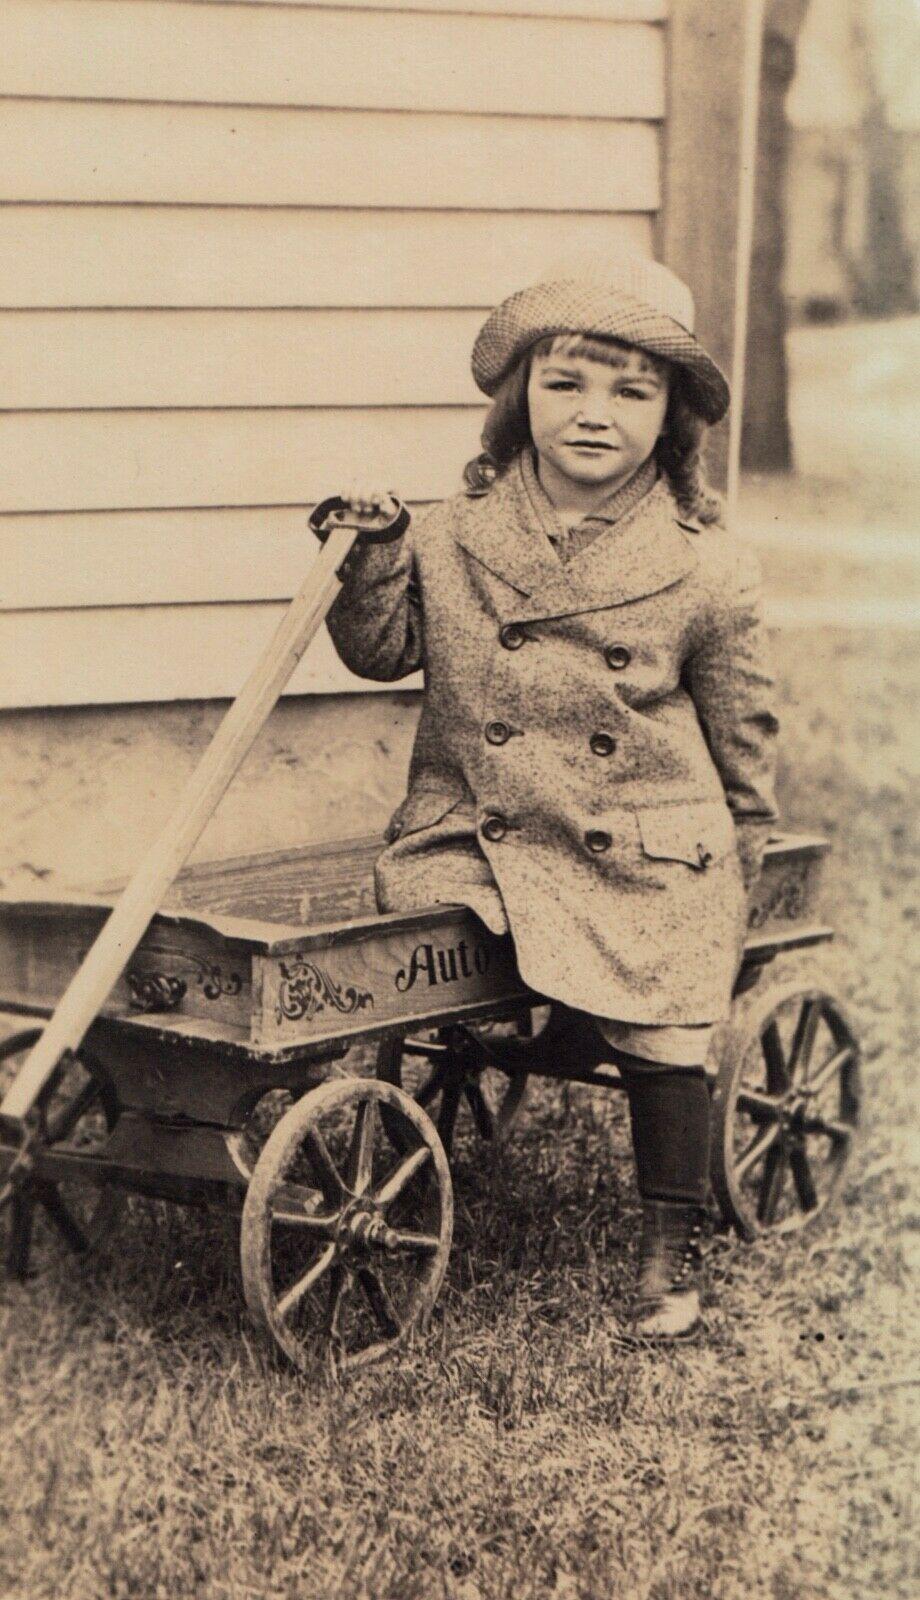 Auto-Wheel Coaster and girl, photo postcard (c1910).jpg